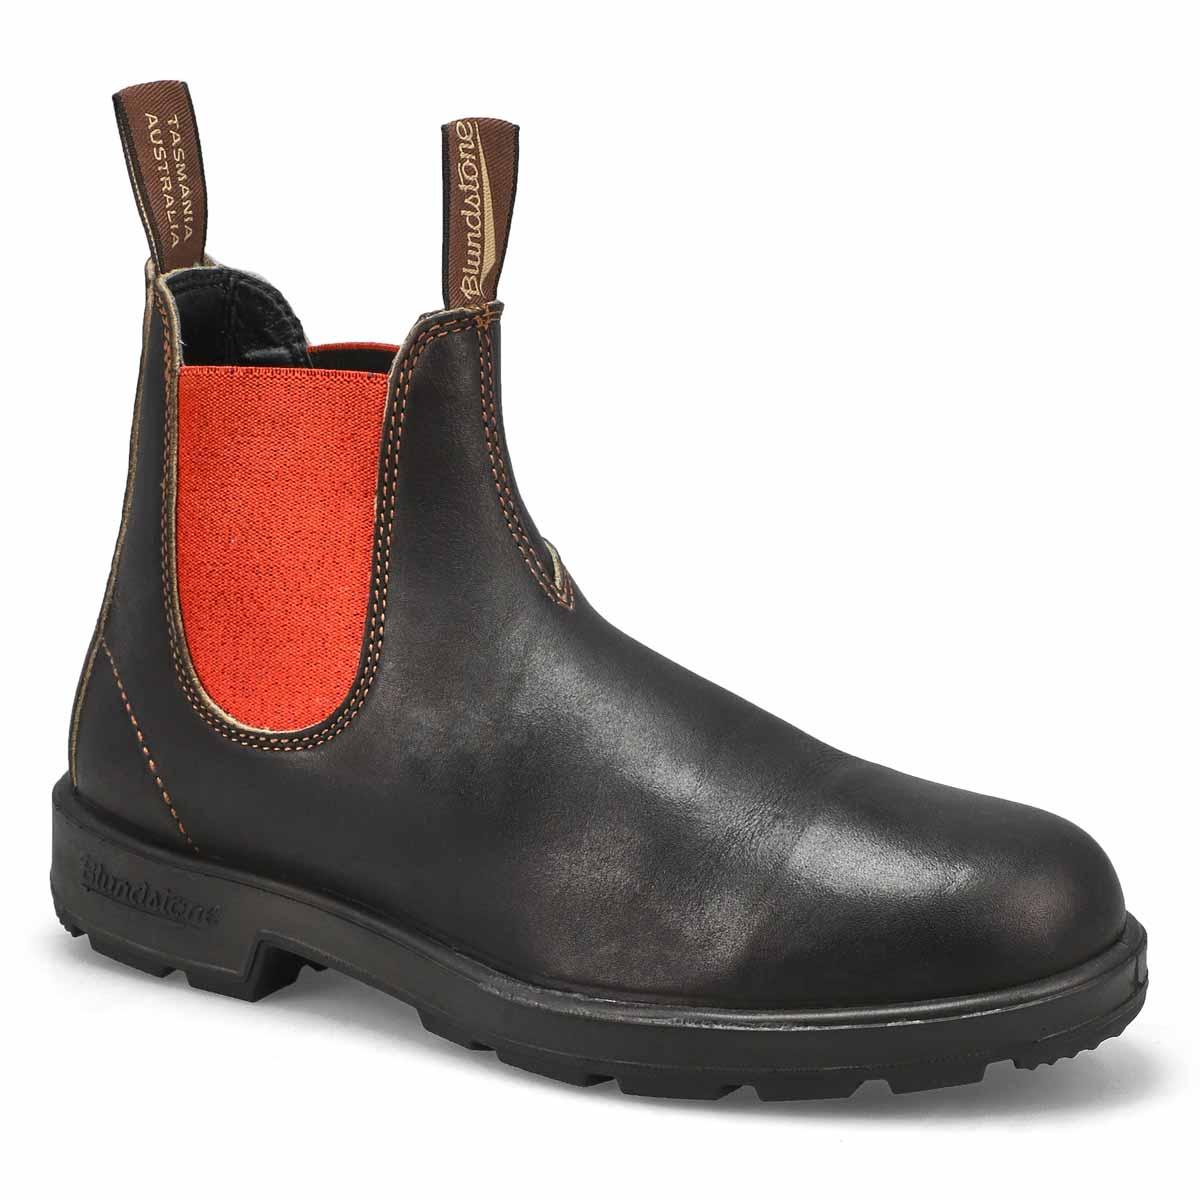 Unisex Original stout brn twin gore boot